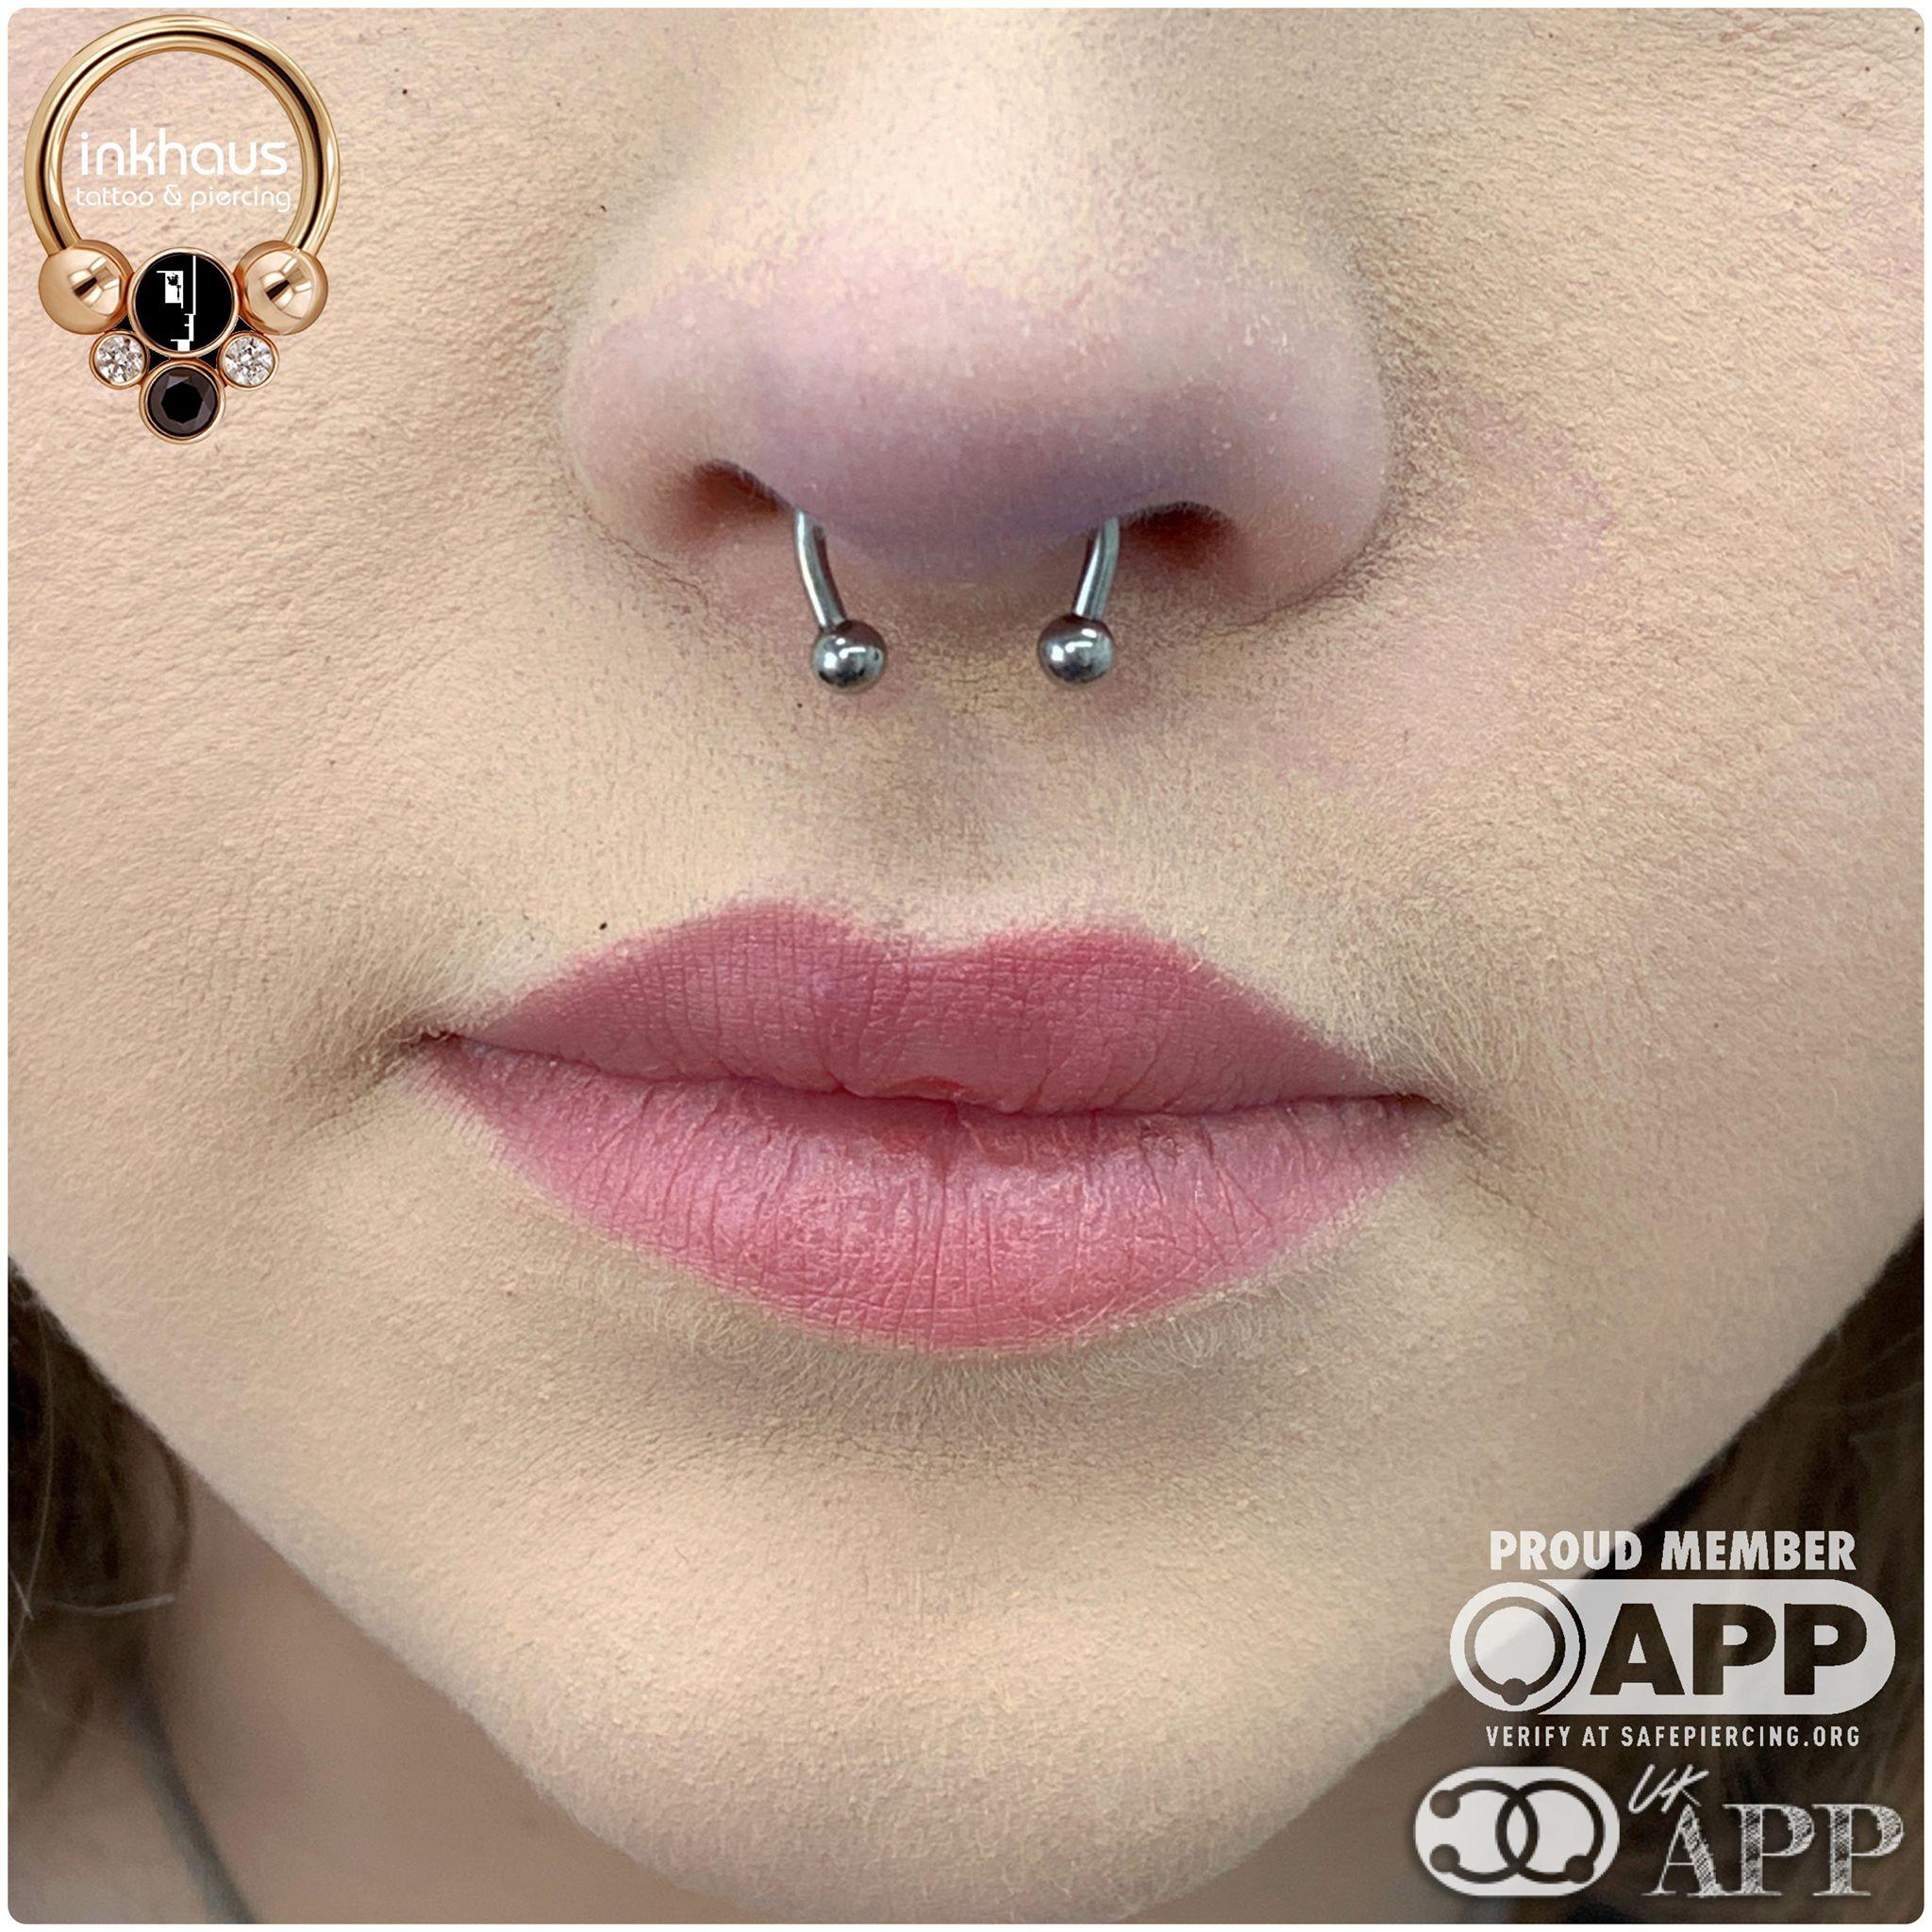 Septum Piercings Inkhaus Tattoo And Piercing